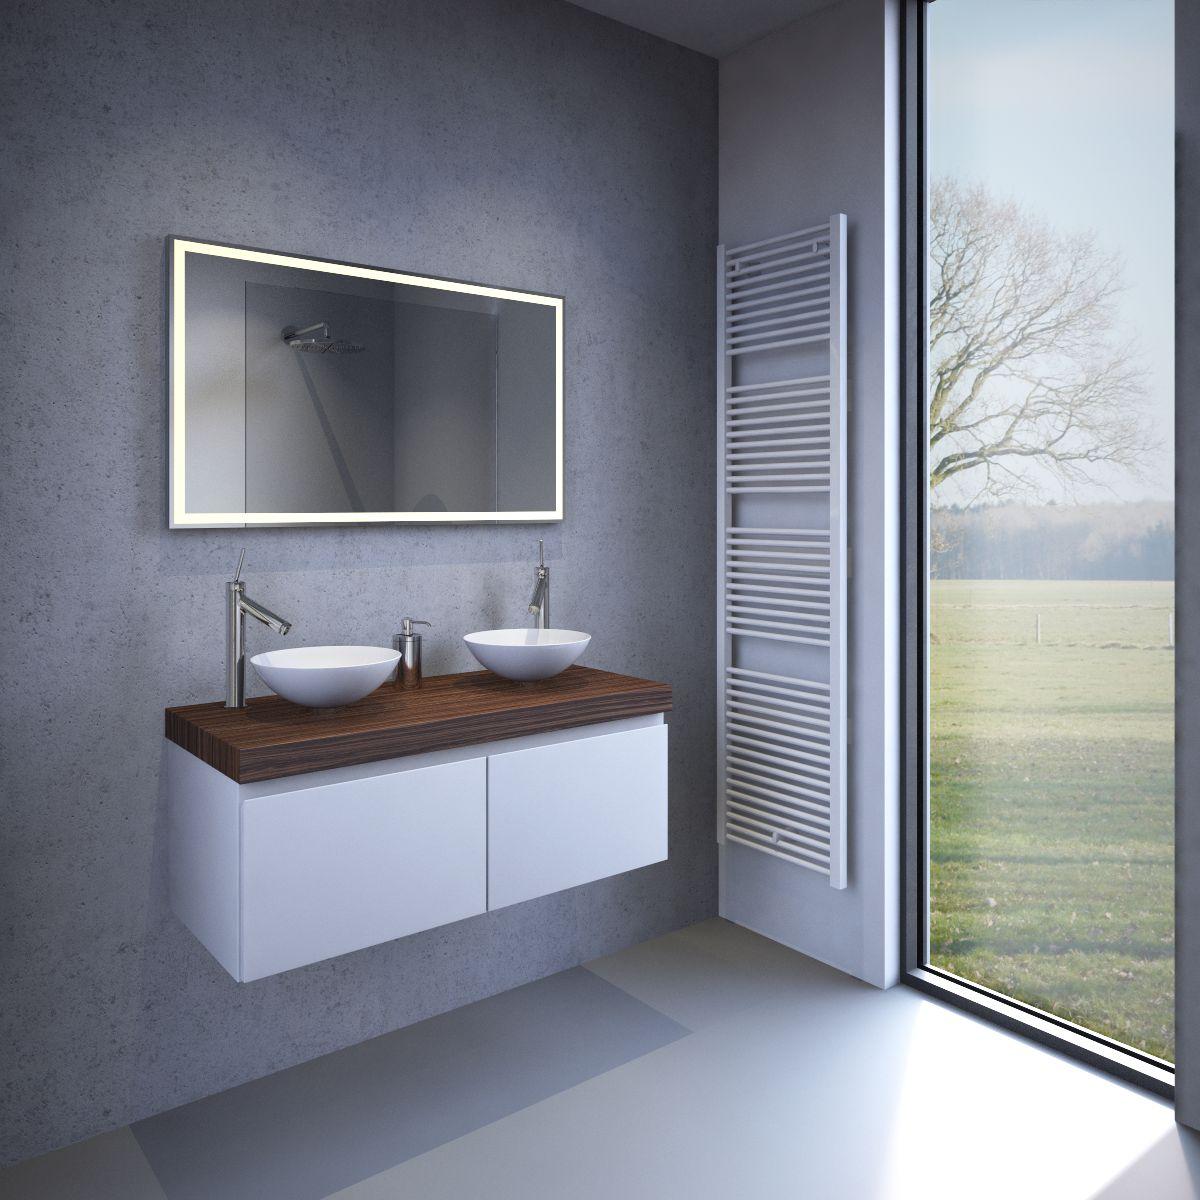 Led verlichting badkamer aanbiedingen: ... verlichting / spiegels ...